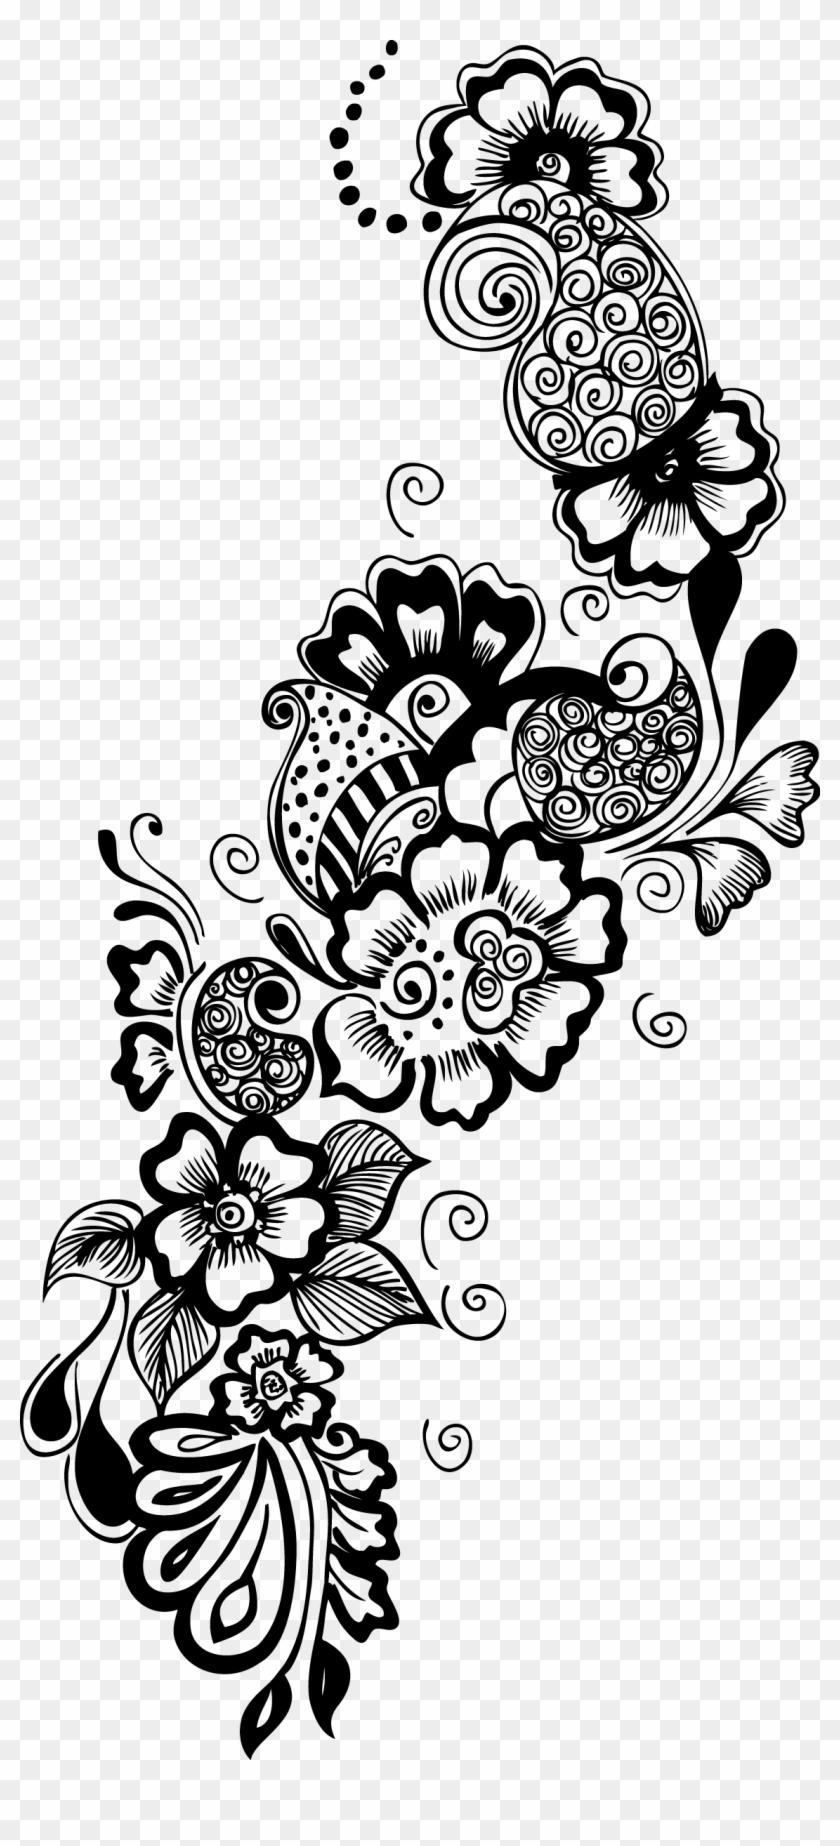 Vector Google Search Clipart Pinterest Design Border - Decorative Flower Vector Transparent - Png Download #1469785